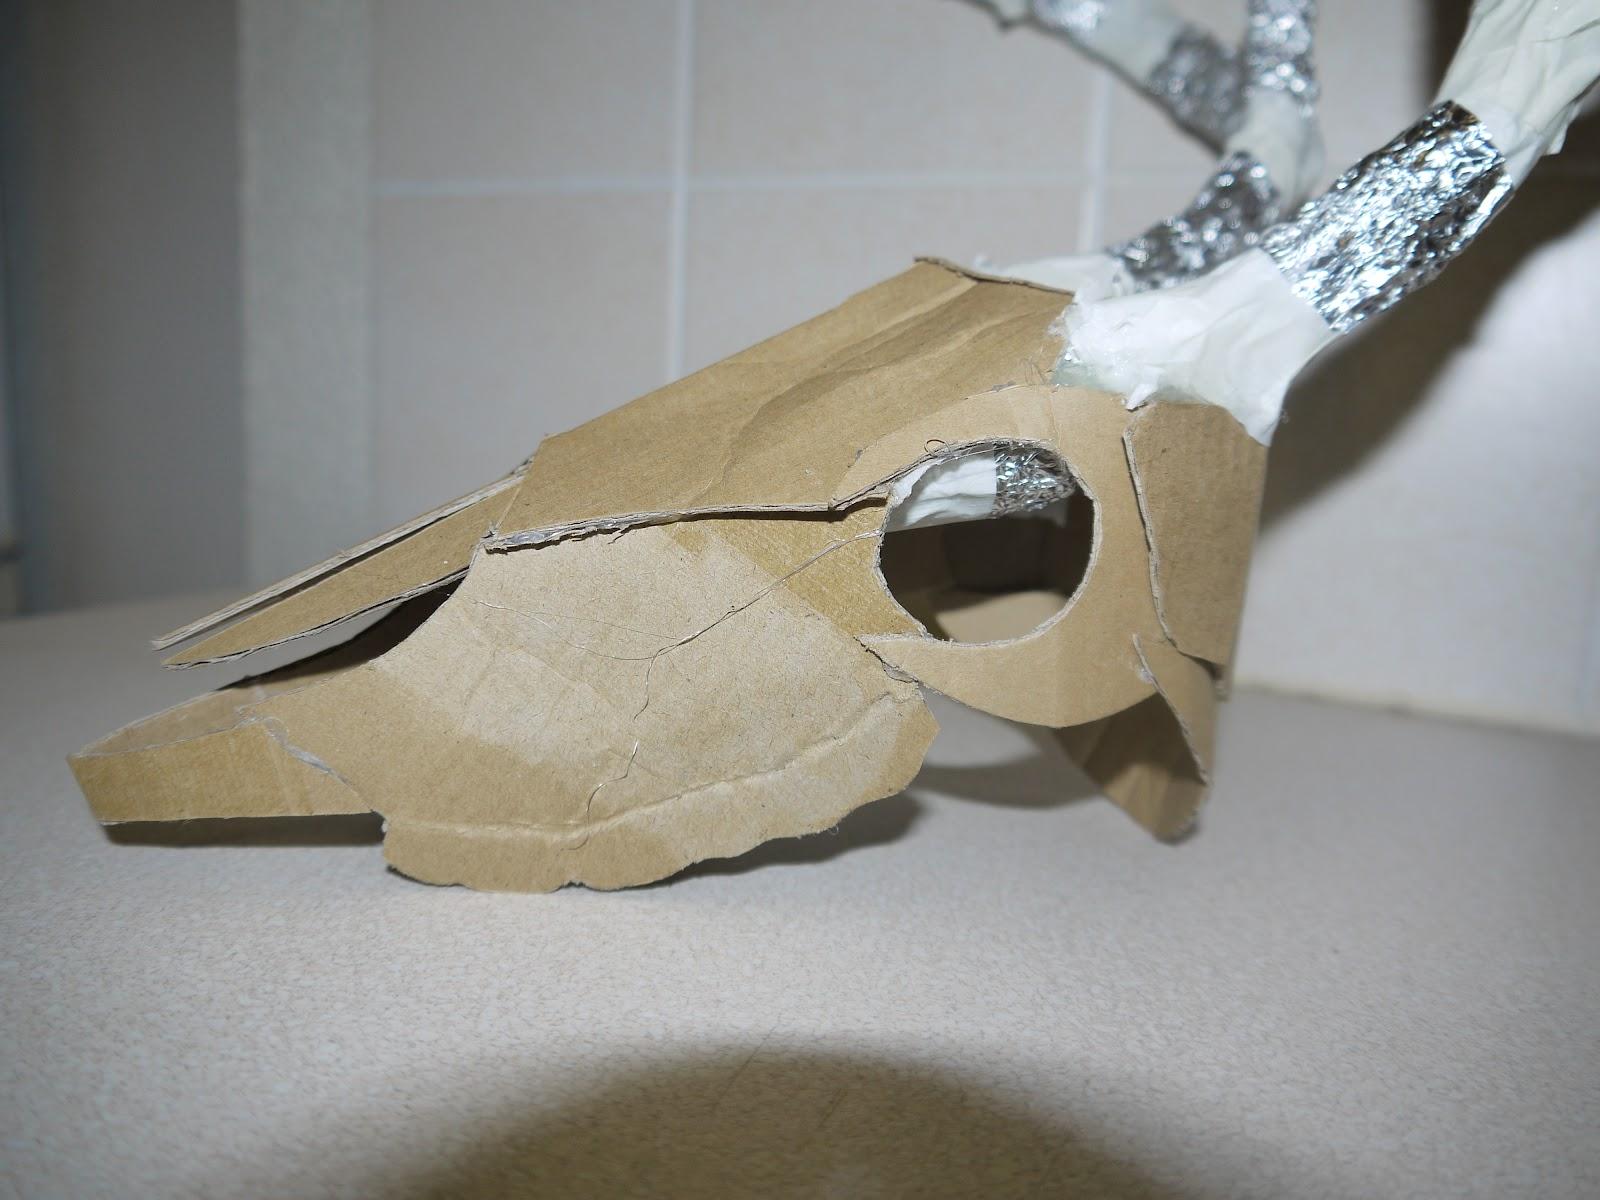 Complimentary Studies Sculptural Metals Cardboard Skull Research